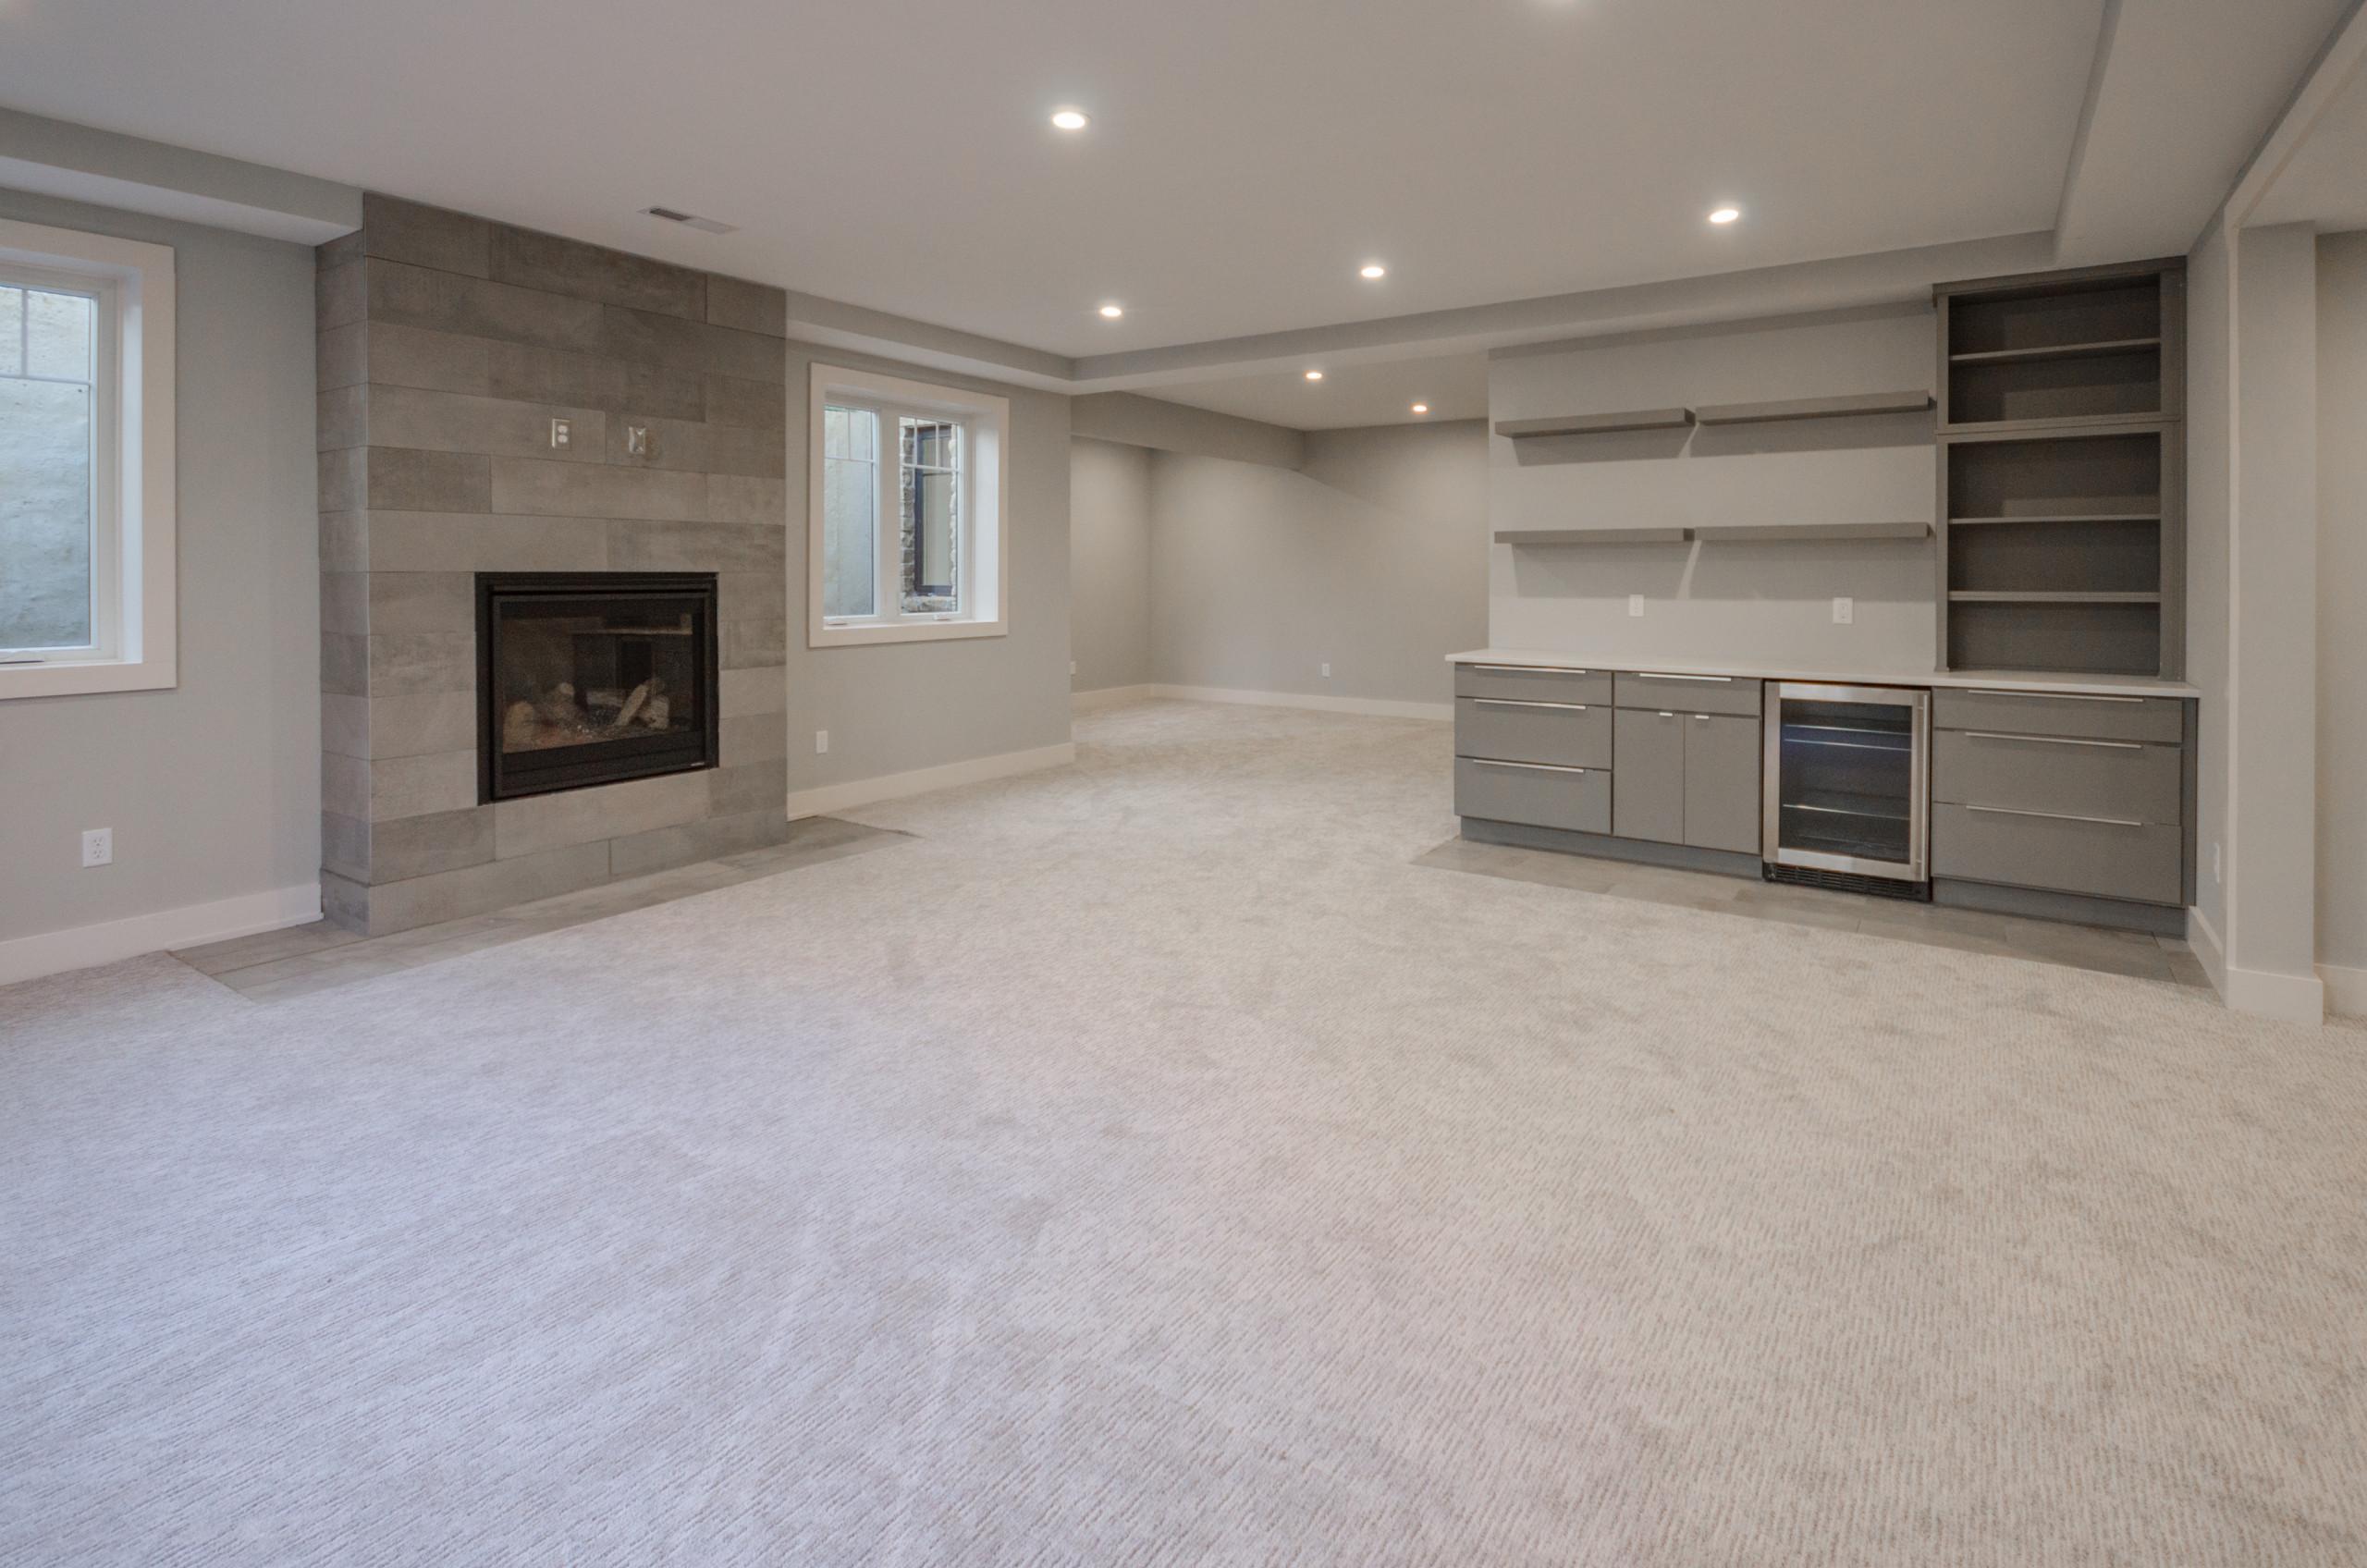 Lower Level Beverage Center & Fireplace